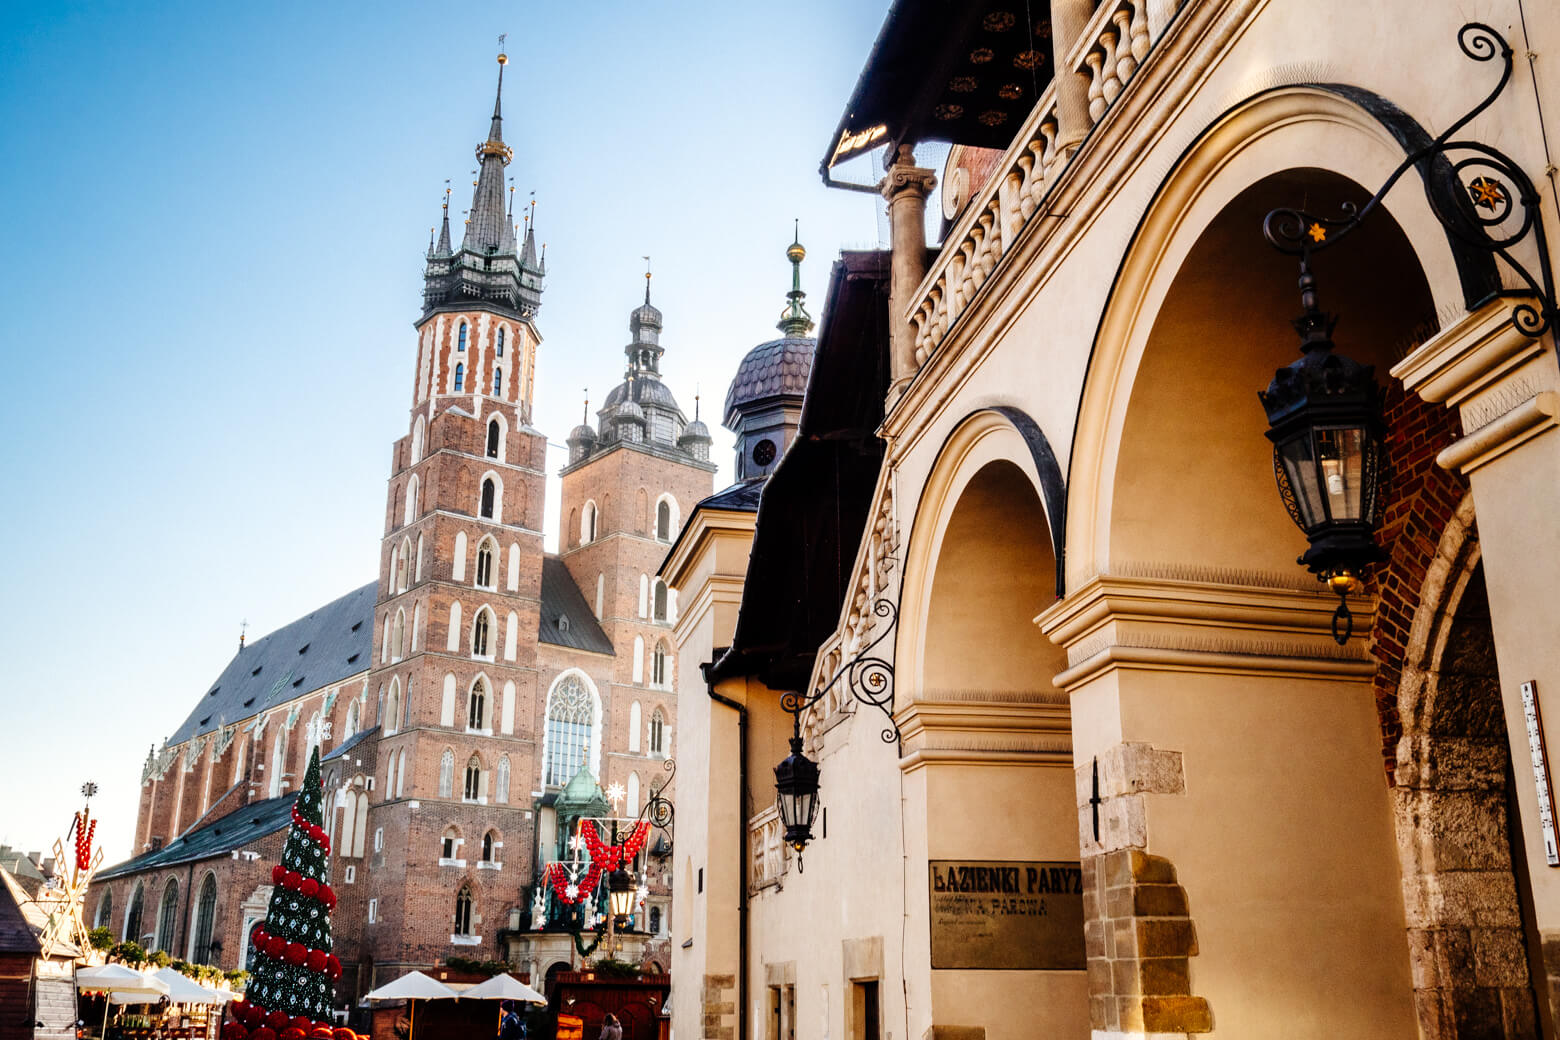 Krakow Main Square Christmas Market